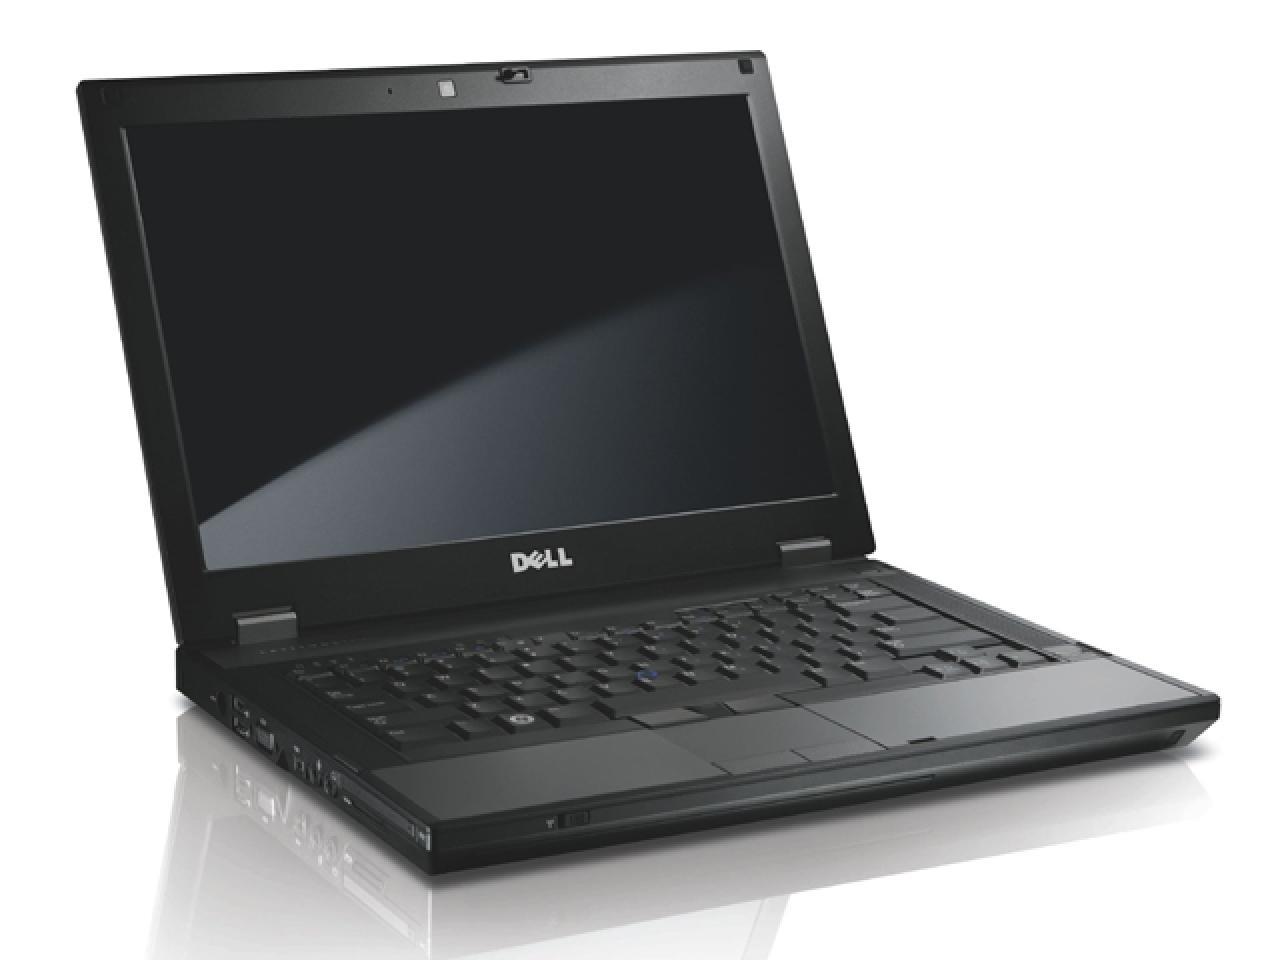 Dell Latitude E6410  - shop.bb-net.de